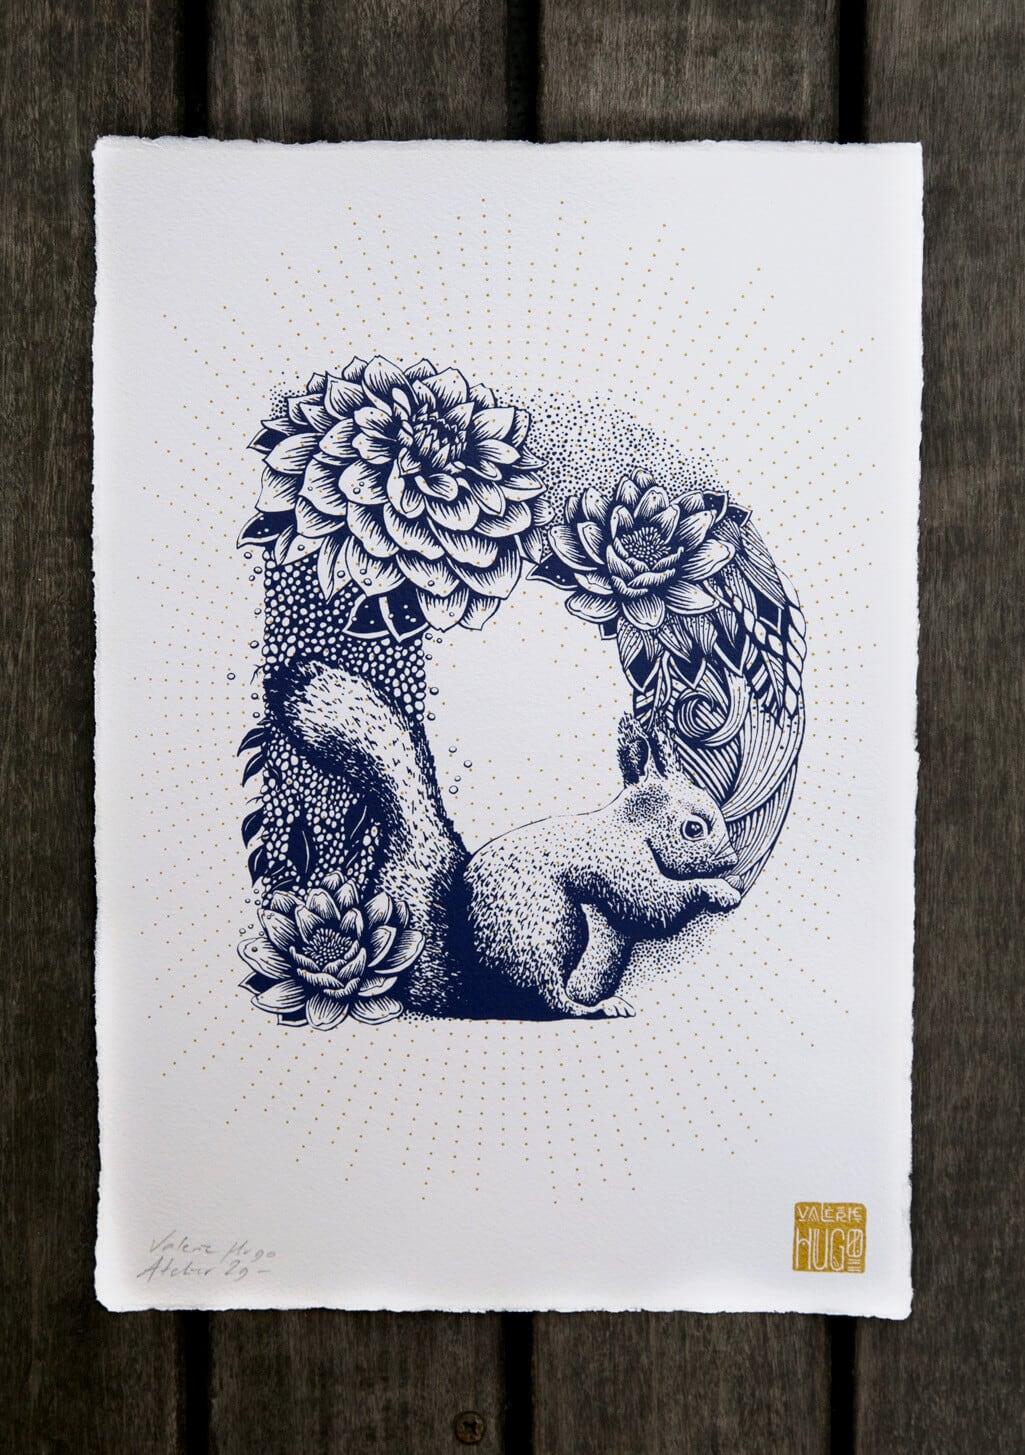 typography-valerie-hugo-fy-4